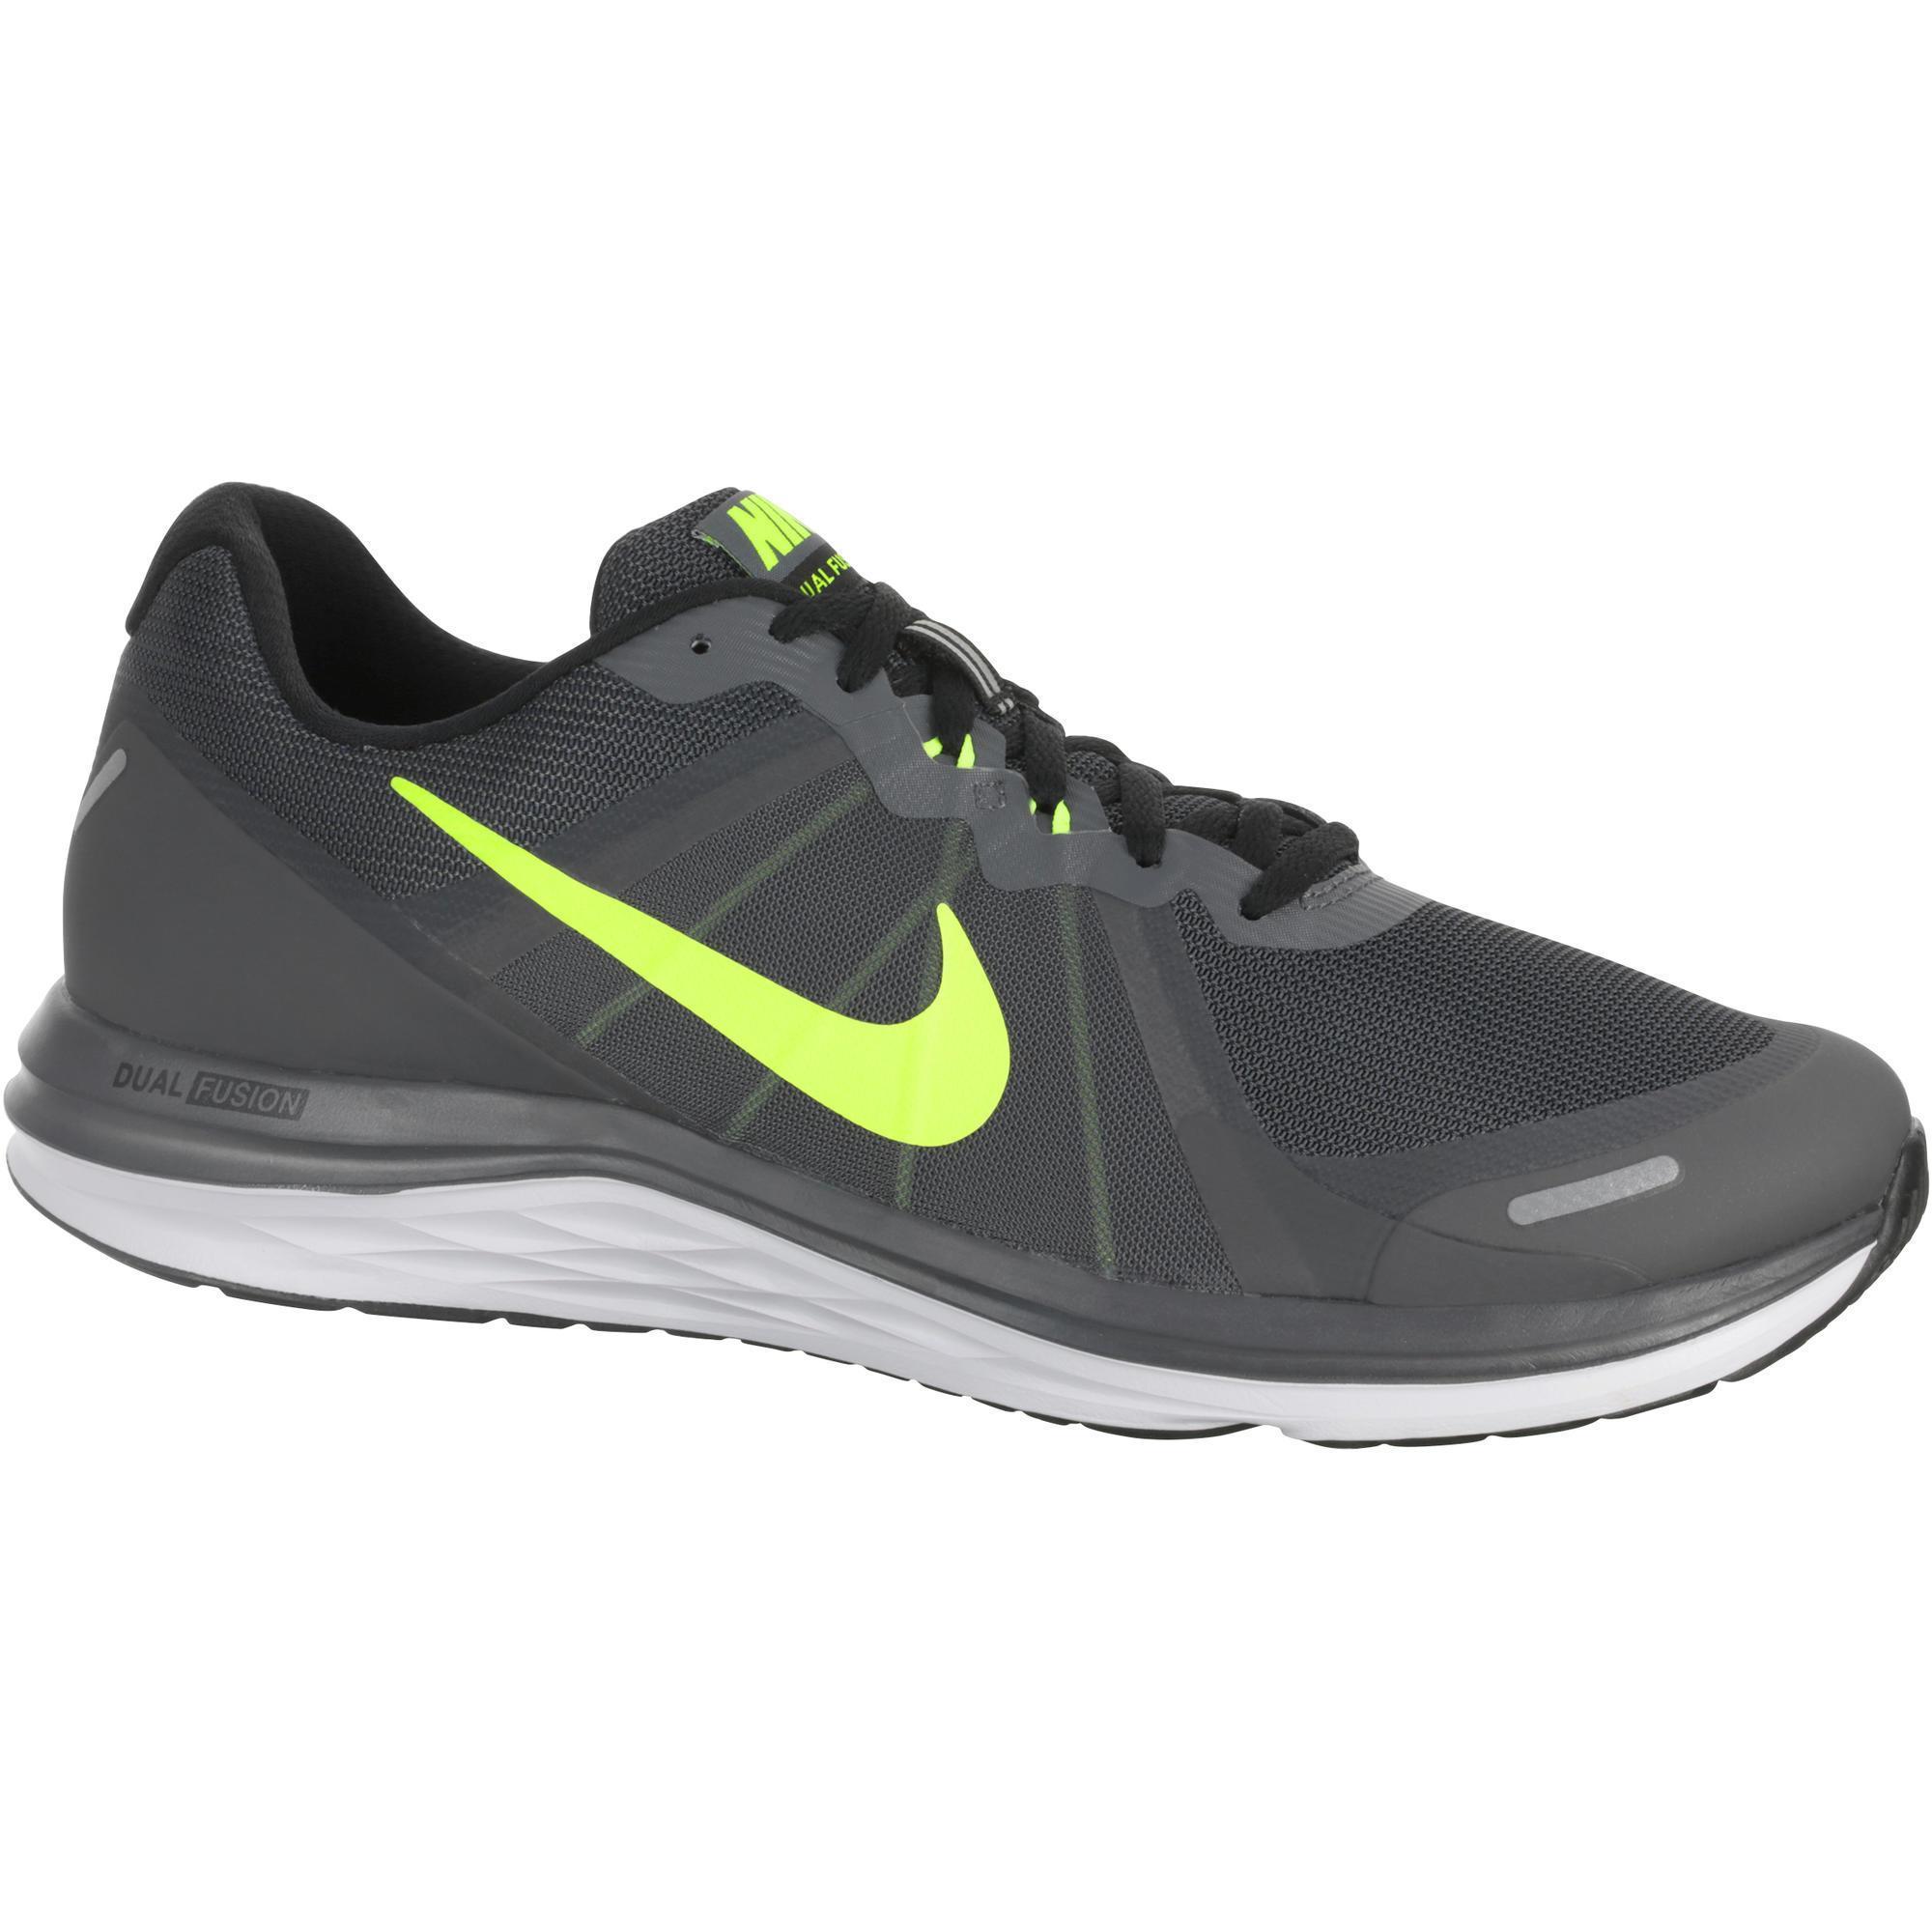 sports shoes c6ffe ab6b5 Zapatillas de running hombre NIKE DUAL FUSION X2 negro gris Nike  Decathlon